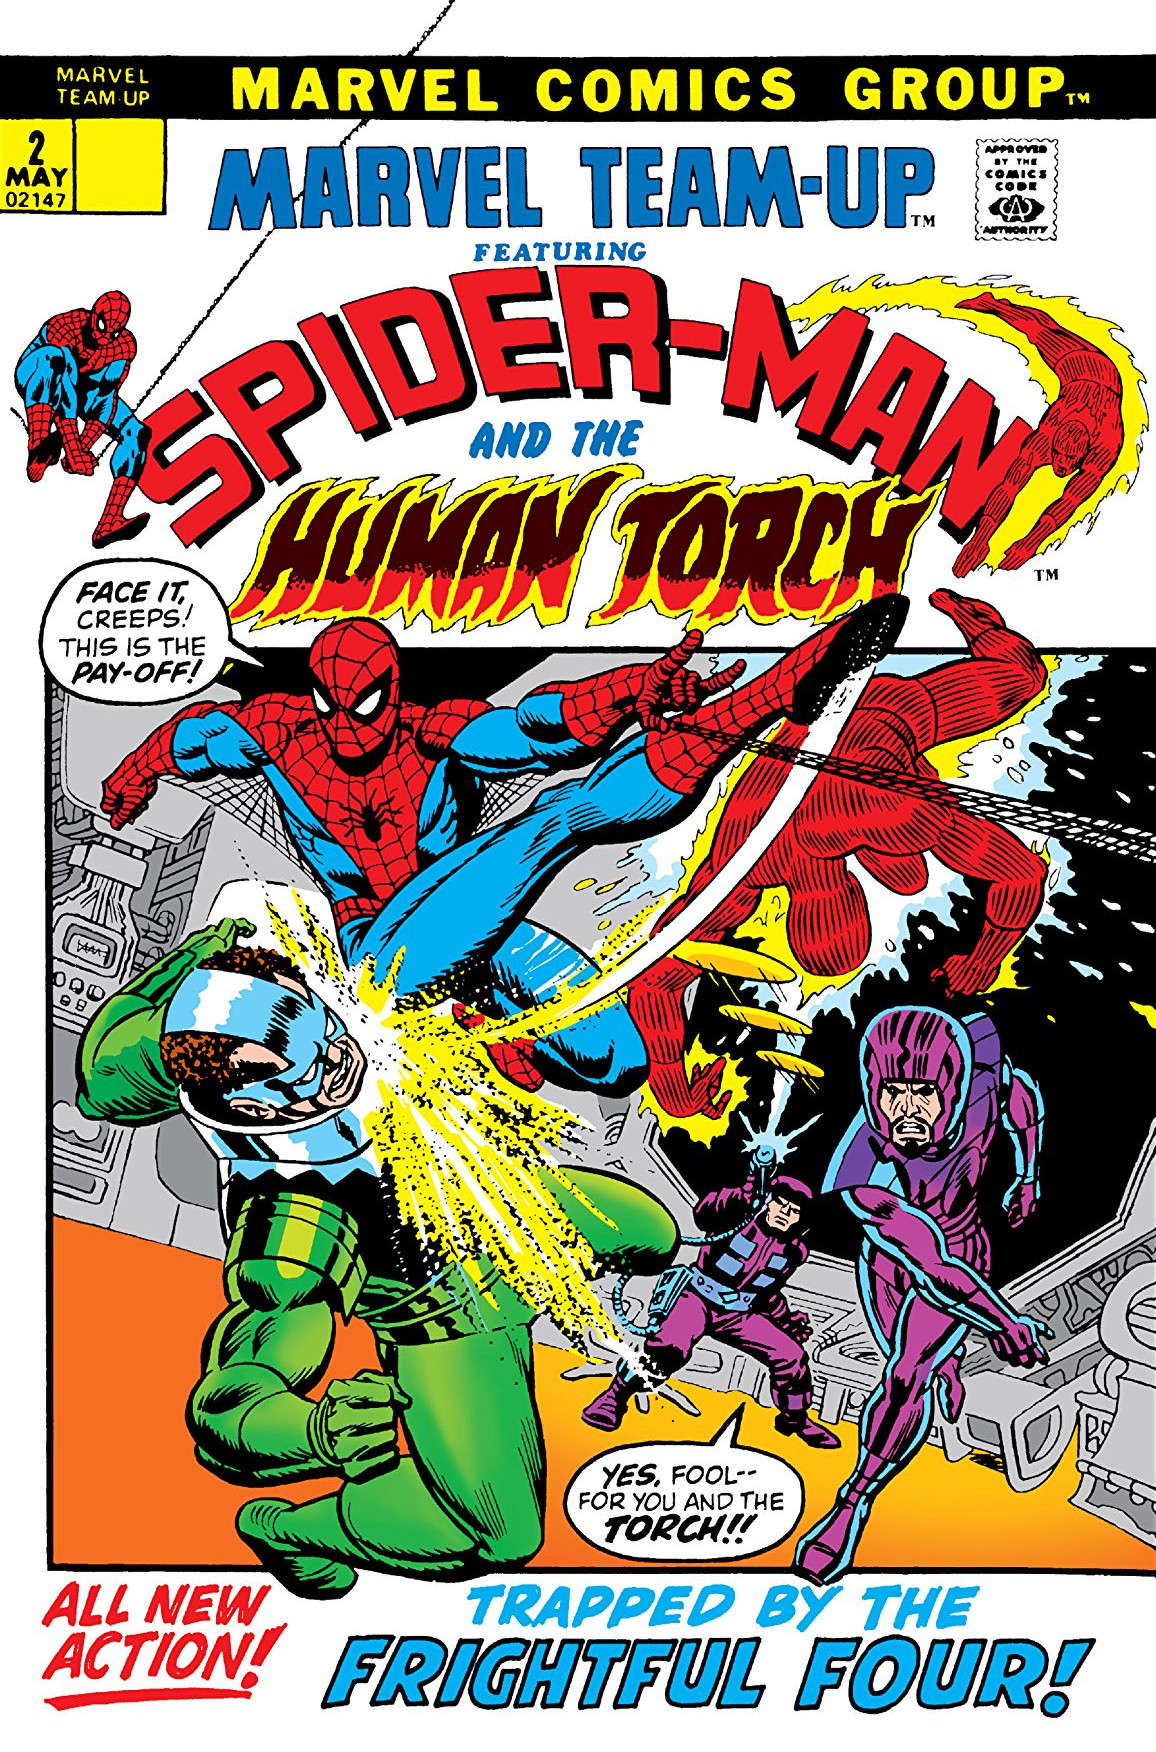 Marvel Team-Up # 2